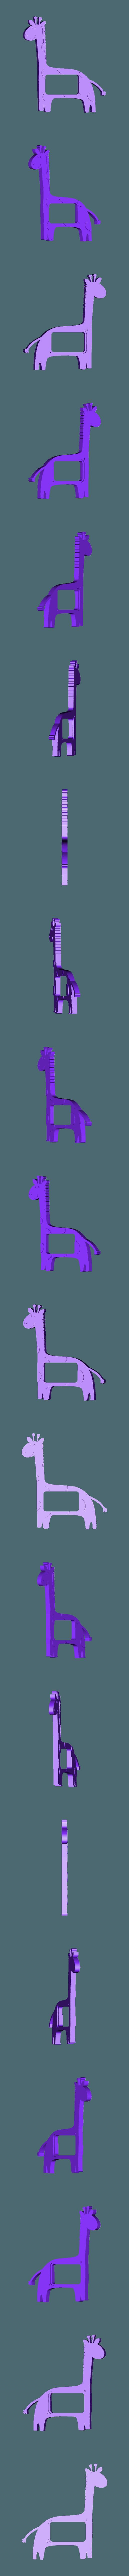 zuro_cerceve.stl Download free STL file Giraffe photo frame • 3D printable template, JustAmaze